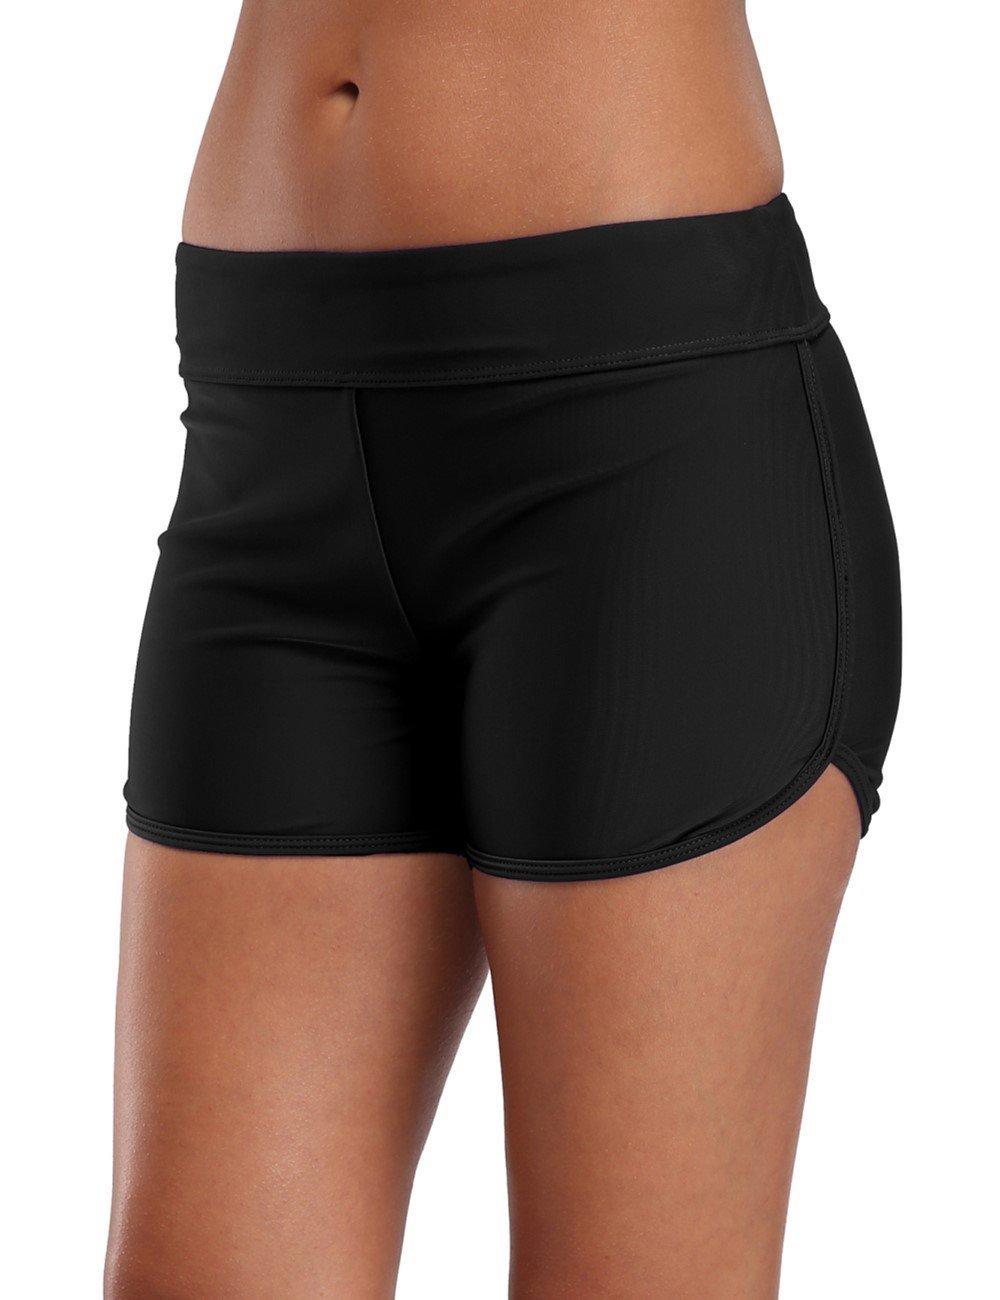 eulo Women's Swim Shorts Boyleg Swim Bottom Tummy Control Board Short Black S